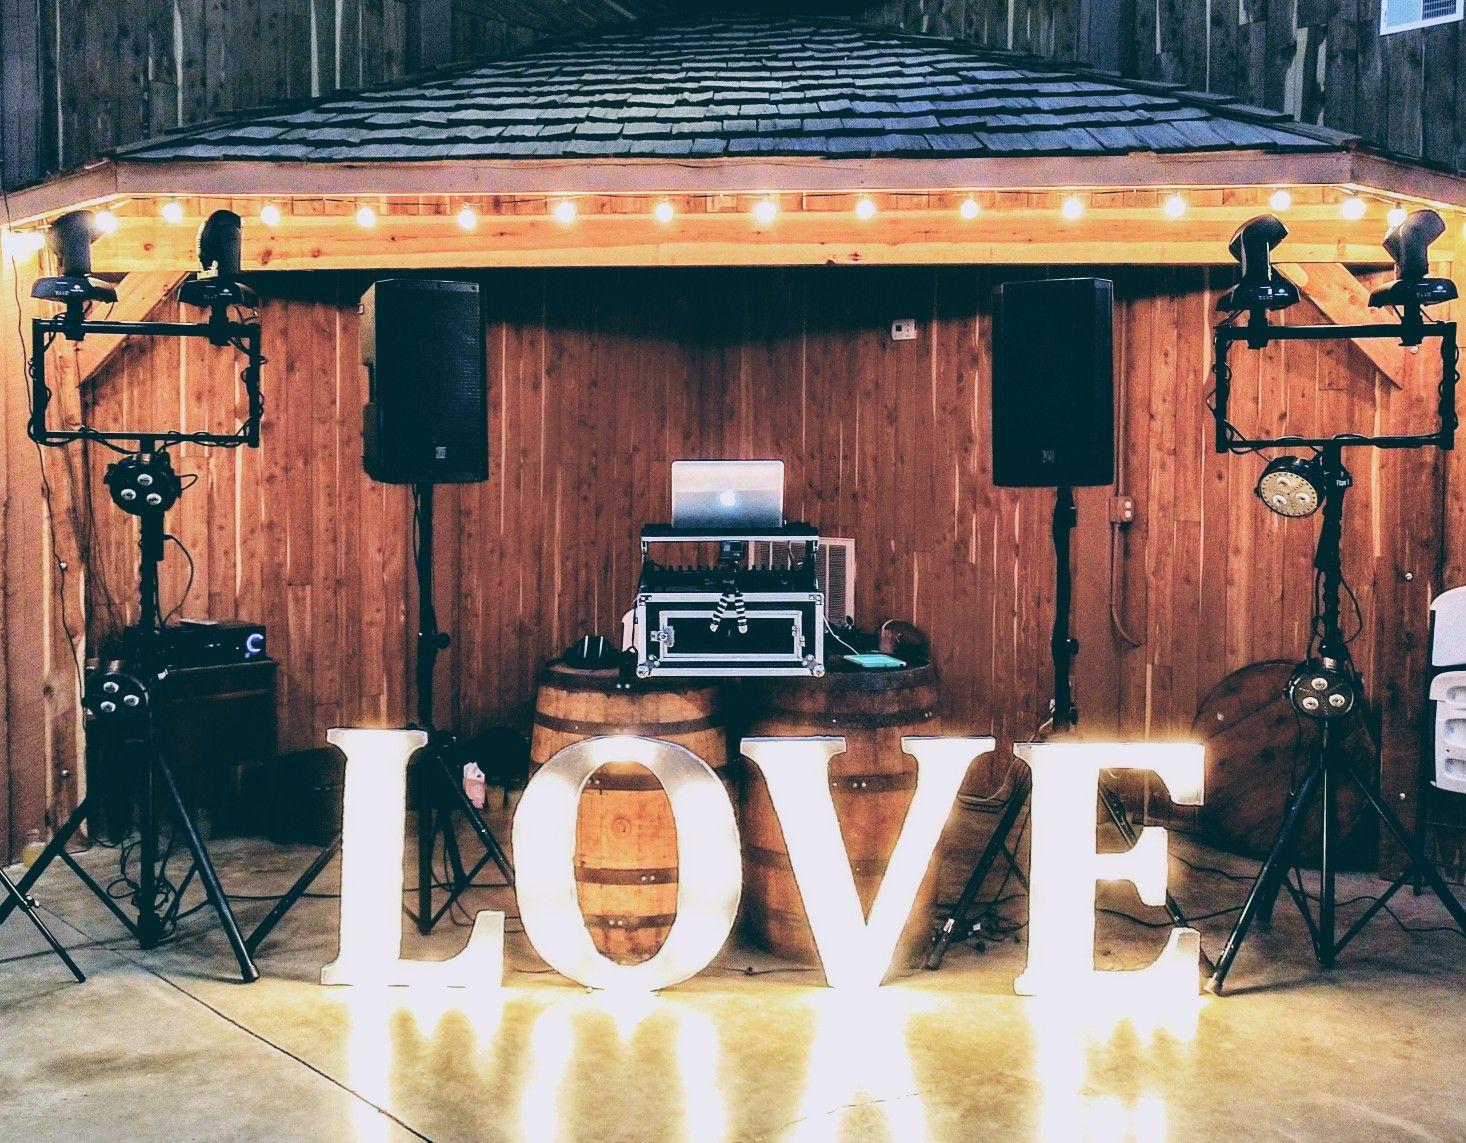 #Rustic #wedding #dj setup @LittlePineyLodge near #Hermann #MO.   #DJNoji #WeddingDJ